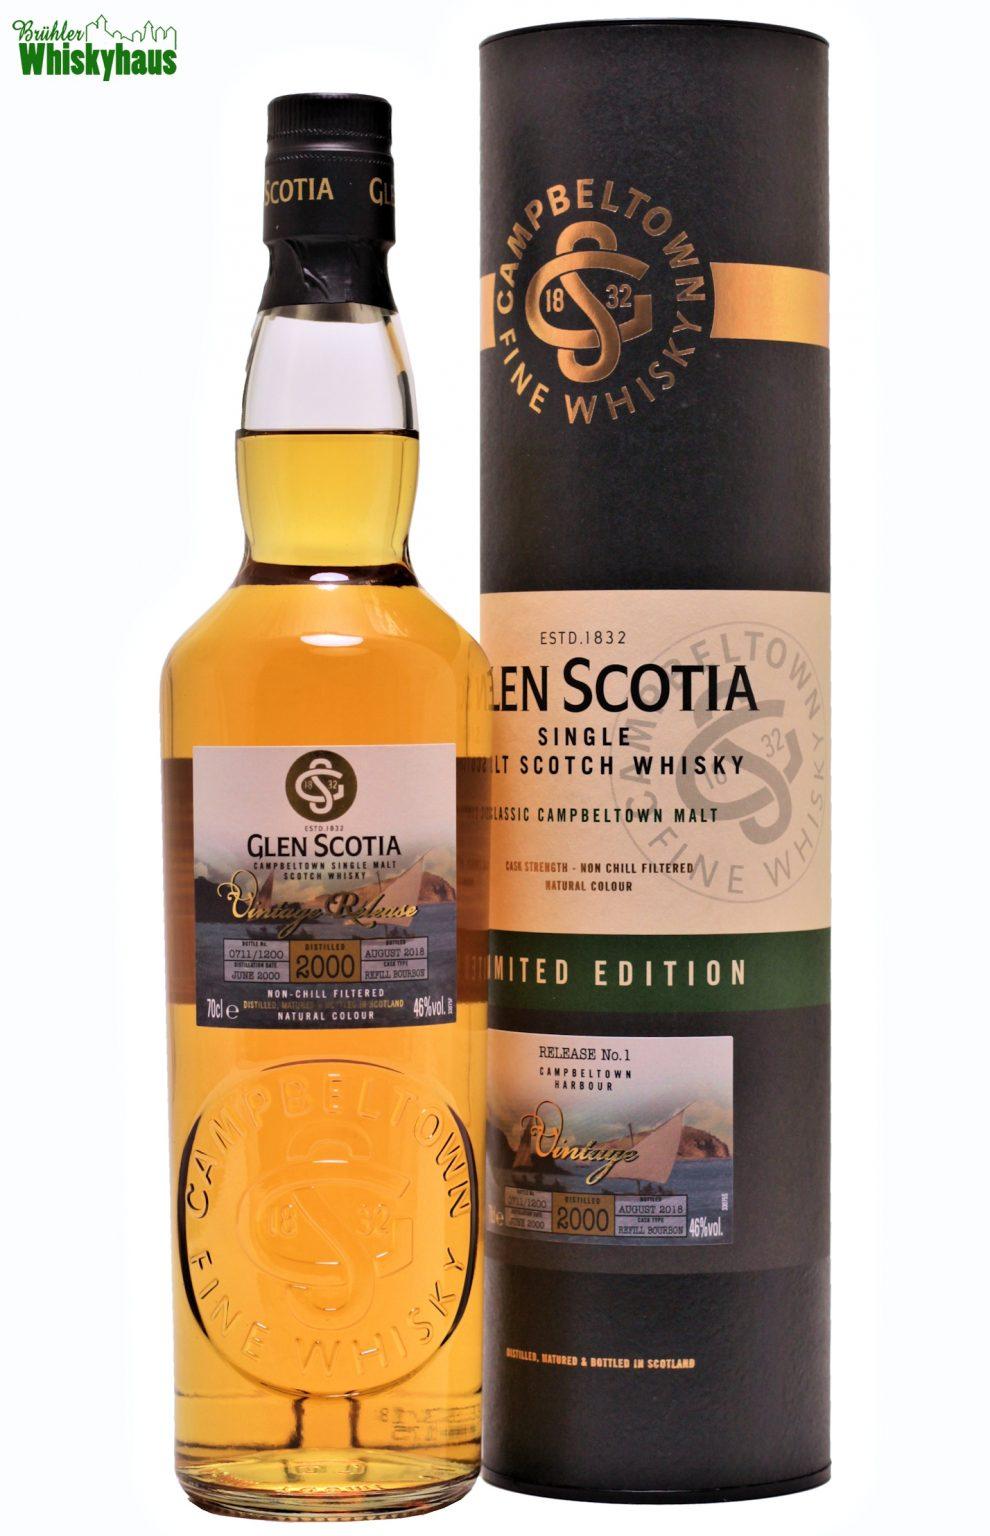 Glen Scotia 18 Jahre - Refill Bourbon Cask - Distillery Bottling Vintage Release N°1 - Single Malt Scotch Whisky